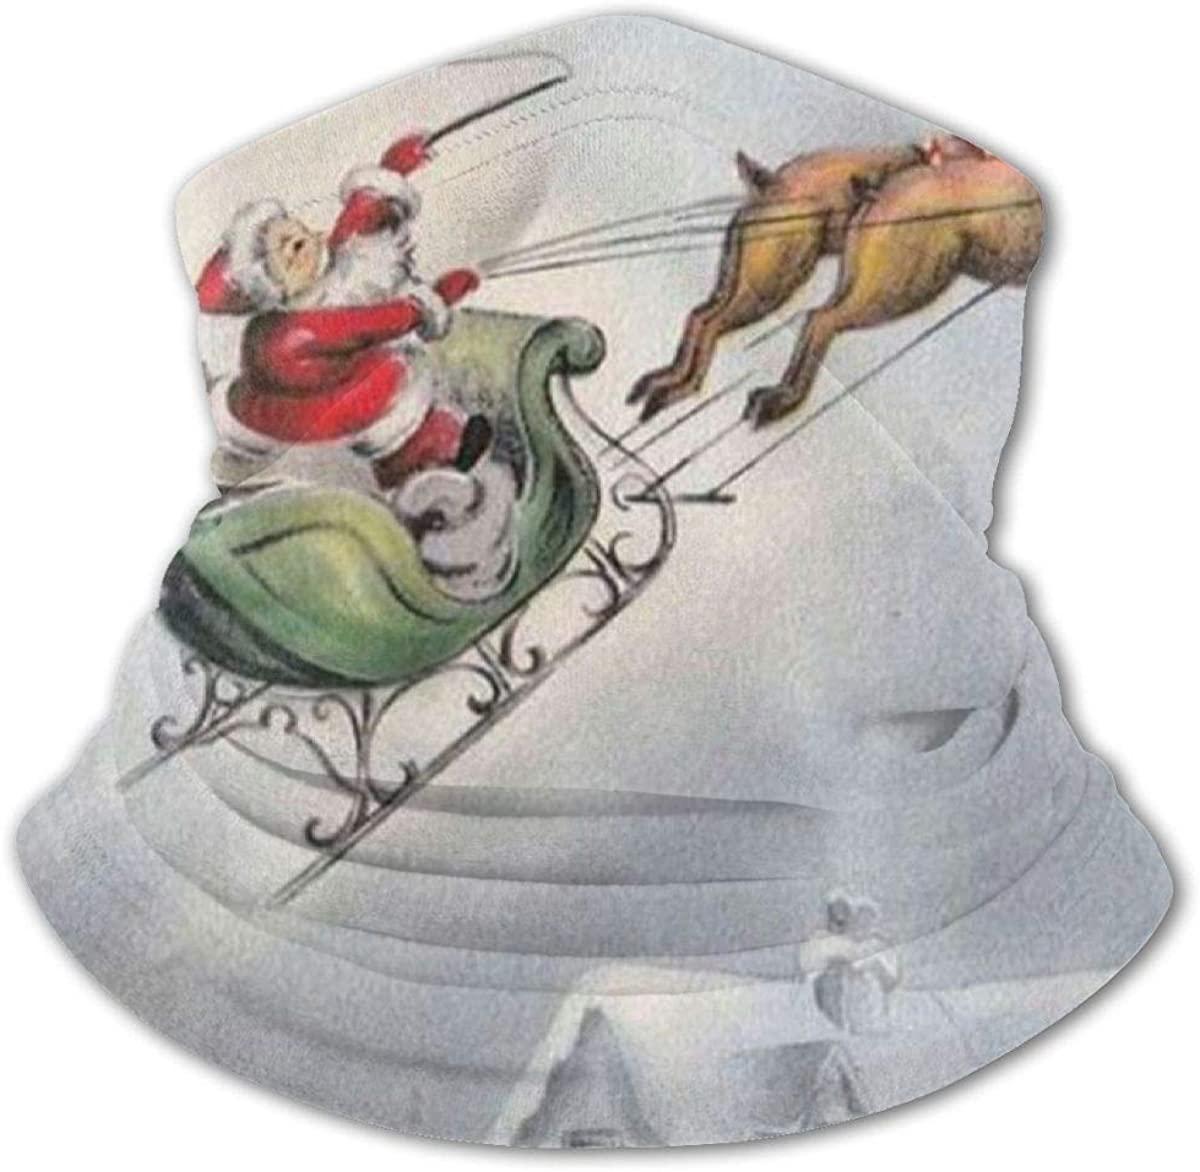 Christmas Deer Headwear For Girls And Boys, Head Wrap, Neck Gaiter, Headband, Tenn Fishing Mask, Magic Scarf, Tube Mask, Face Bandana Mask For Camping Running Cycling